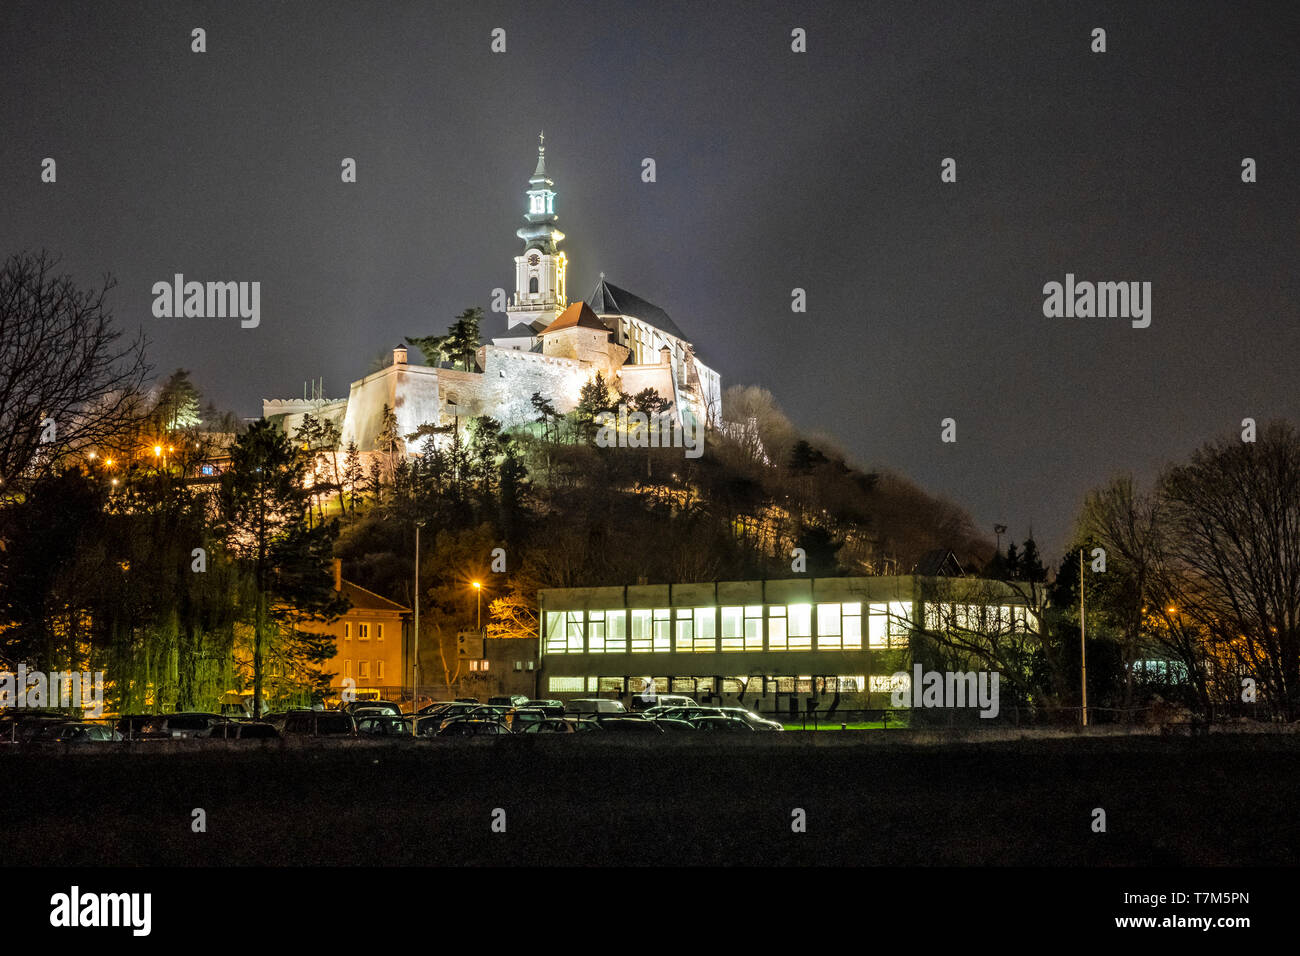 Ancient castle in Nitra, Slovak republic. Night scene. Cultural heritage. Architectural theme. - Stock Image